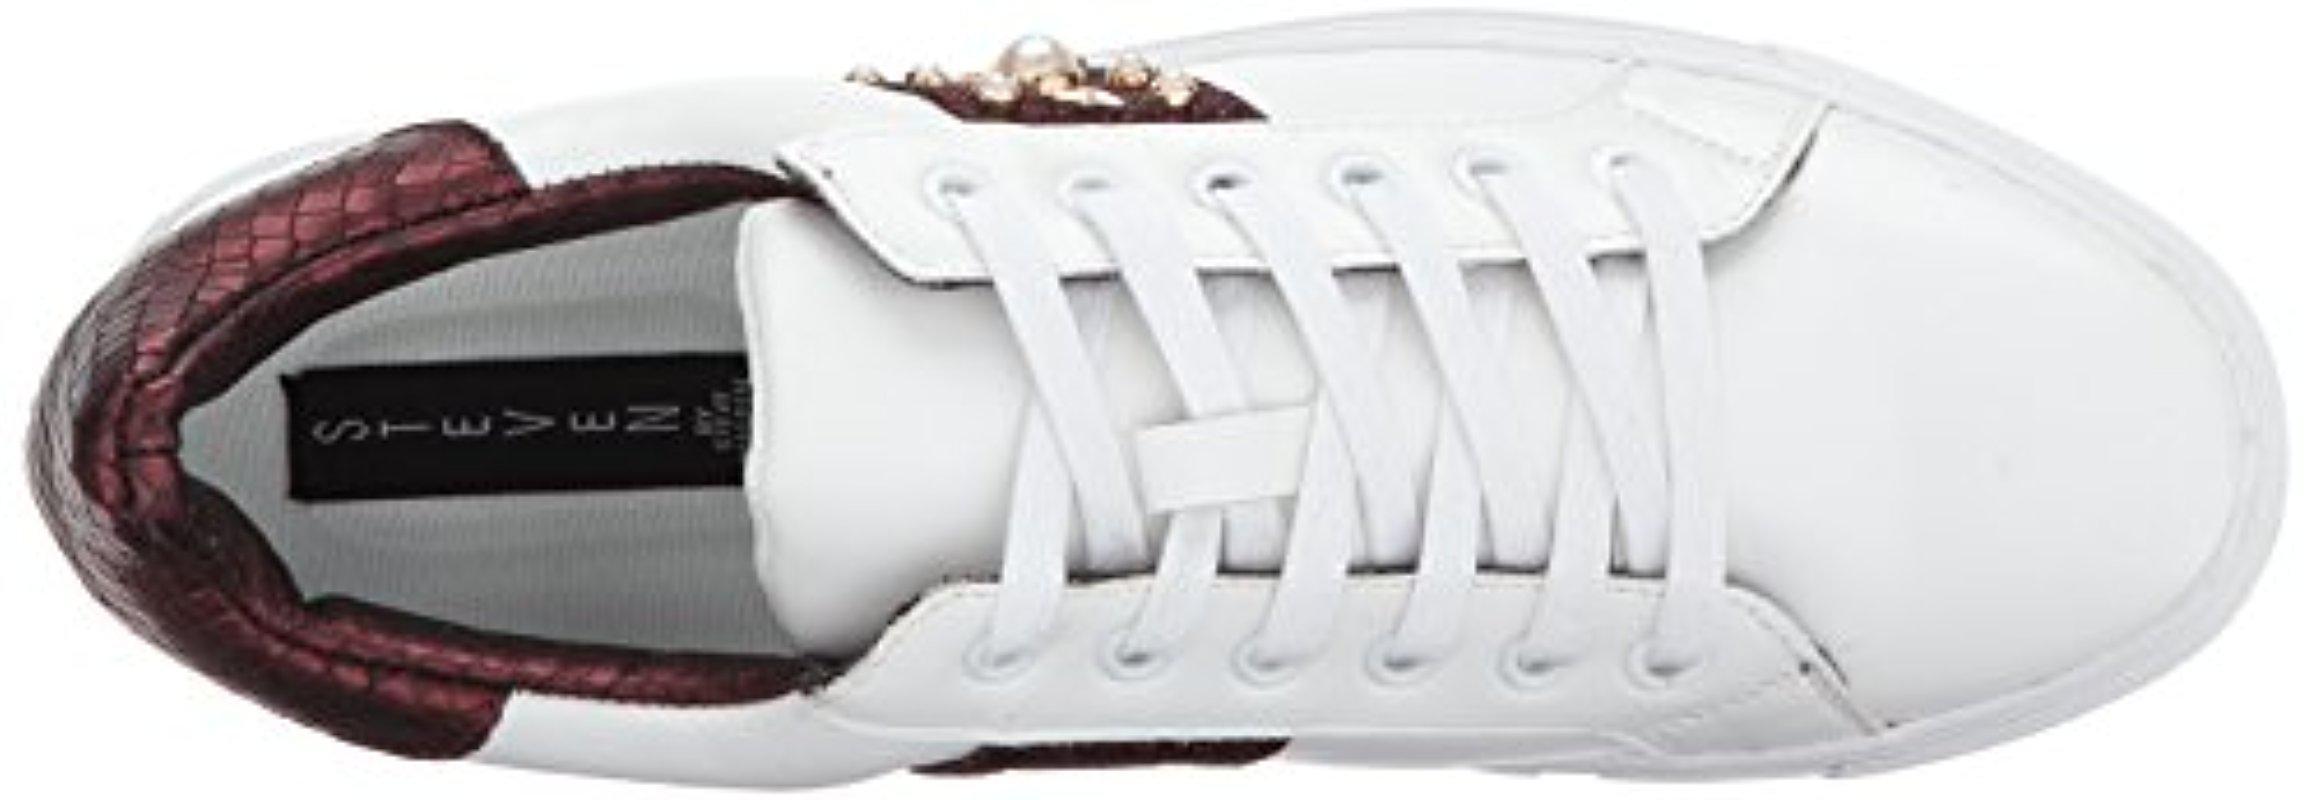 2a6587b515e3c Steven by Steve Madden - White Cory Fashion Sneaker - Lyst